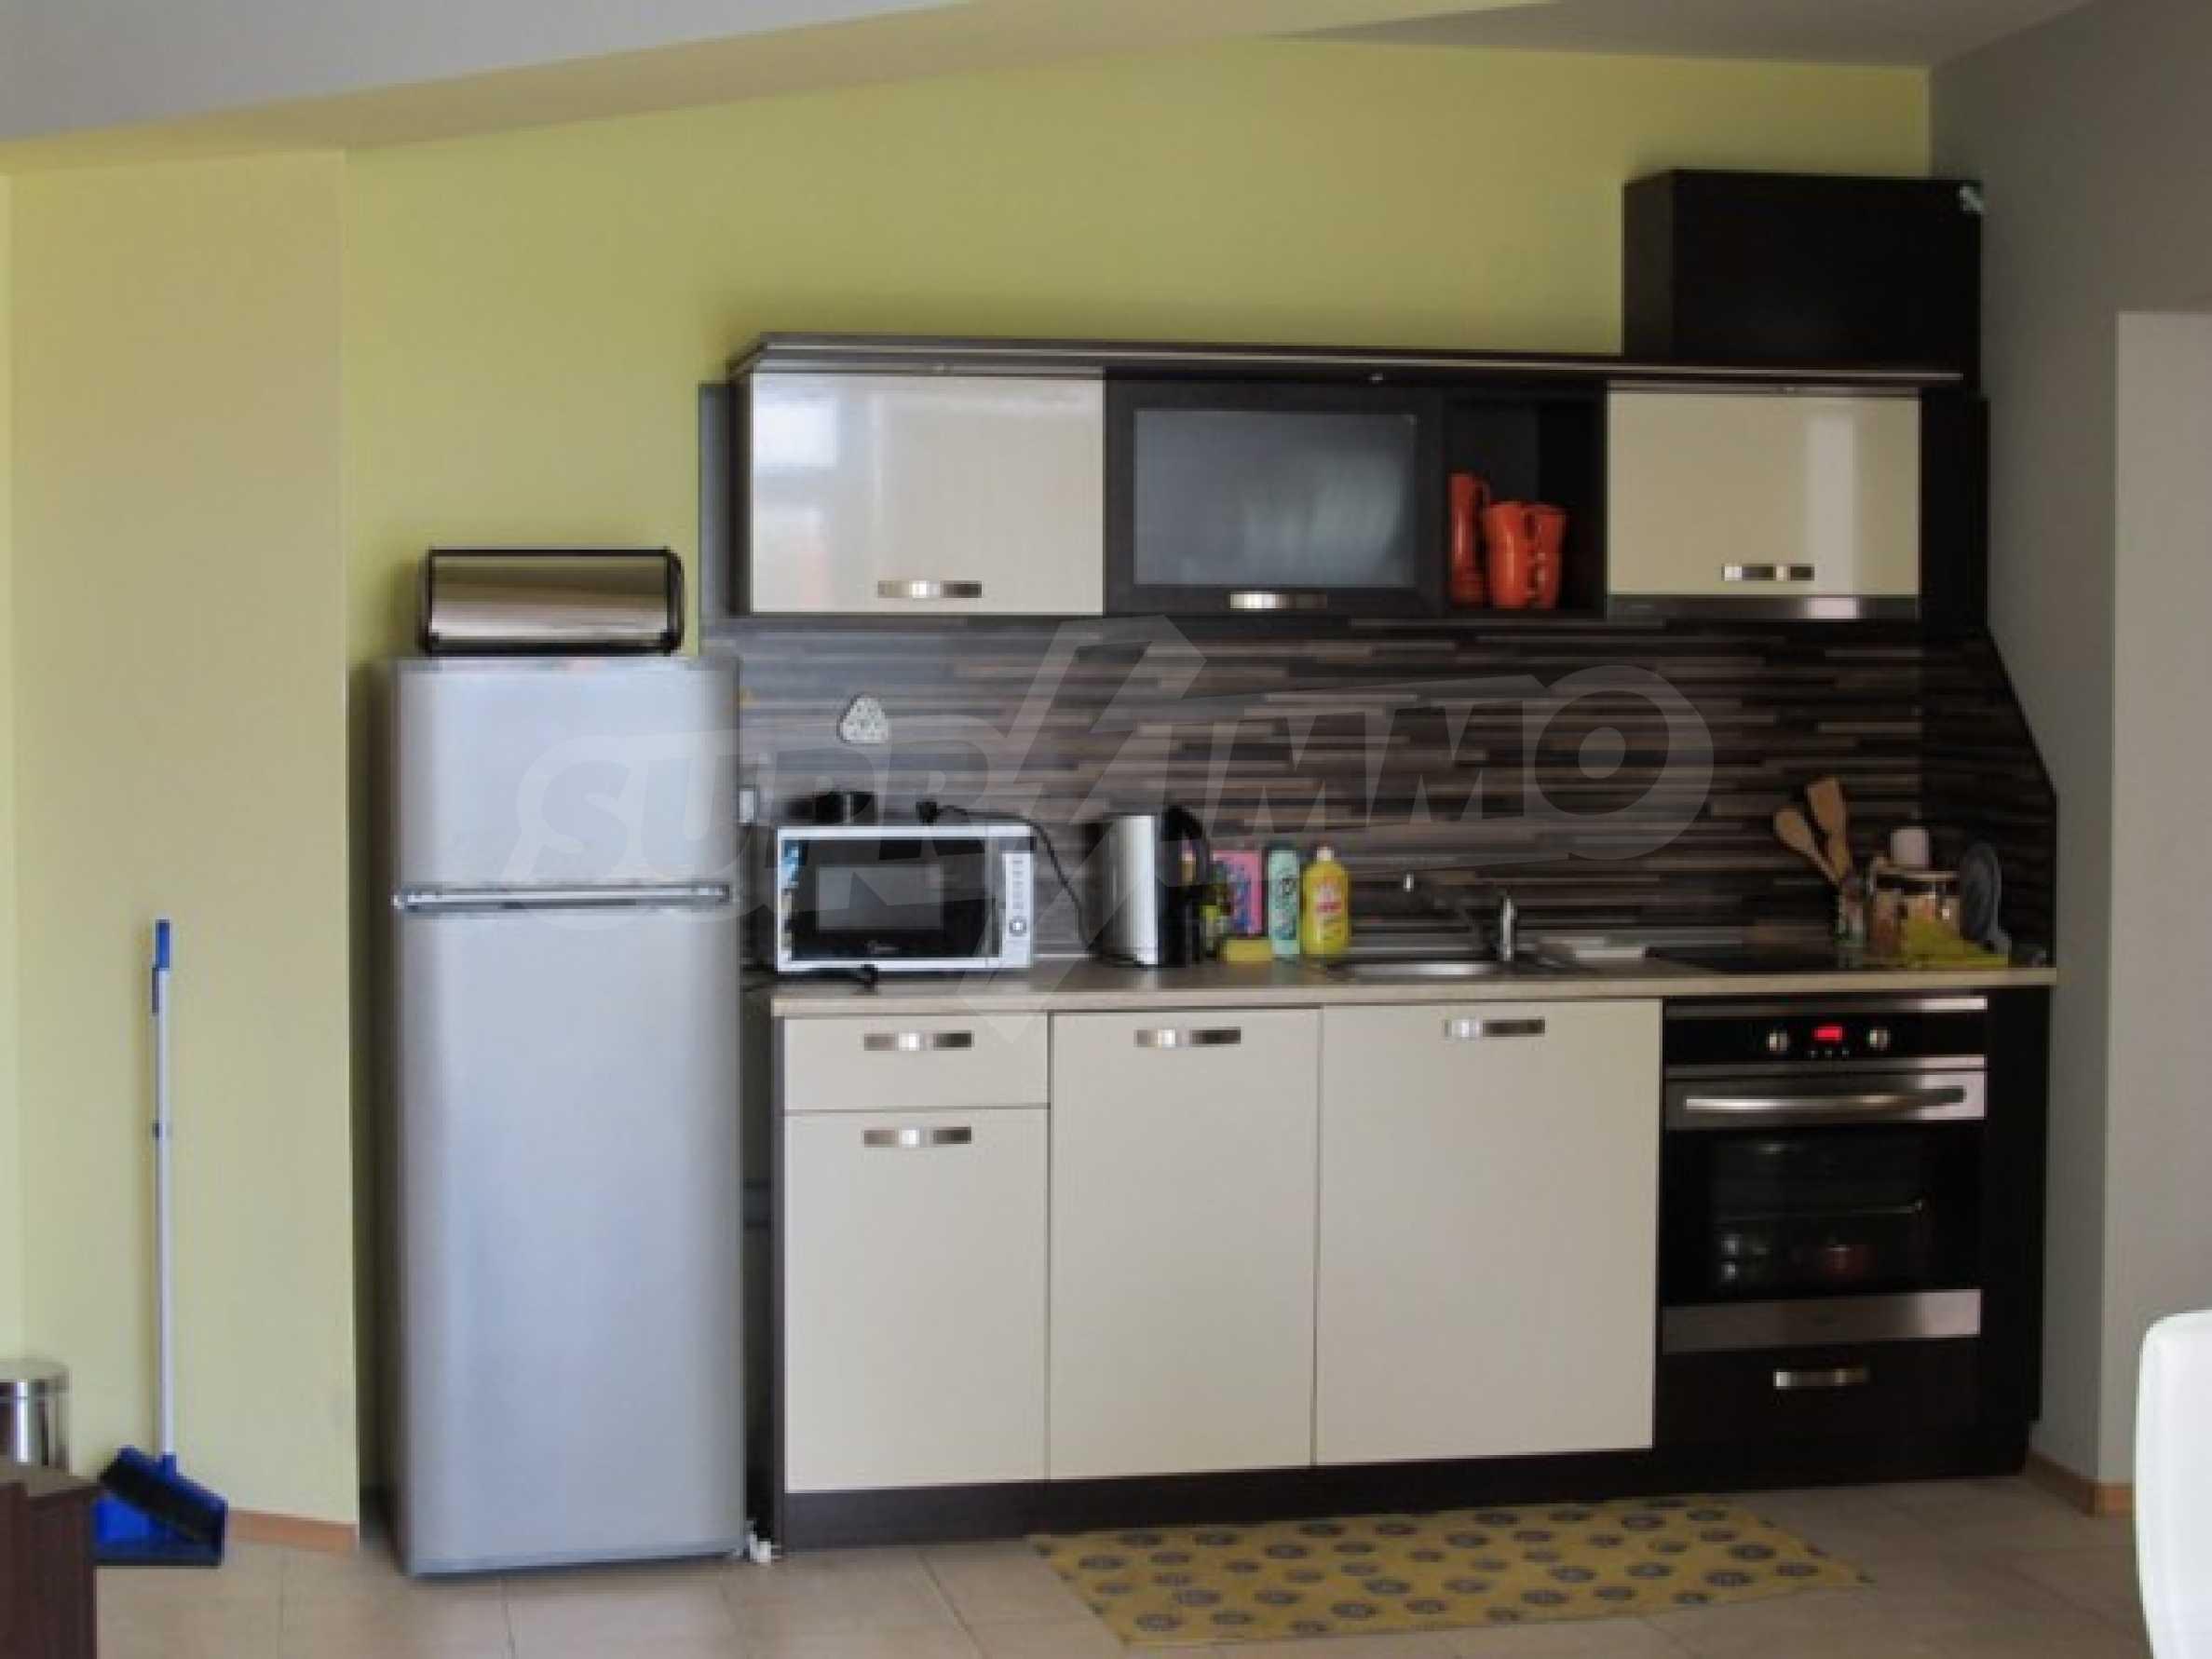 Тристаен апартамент за продажба в Поморие 5